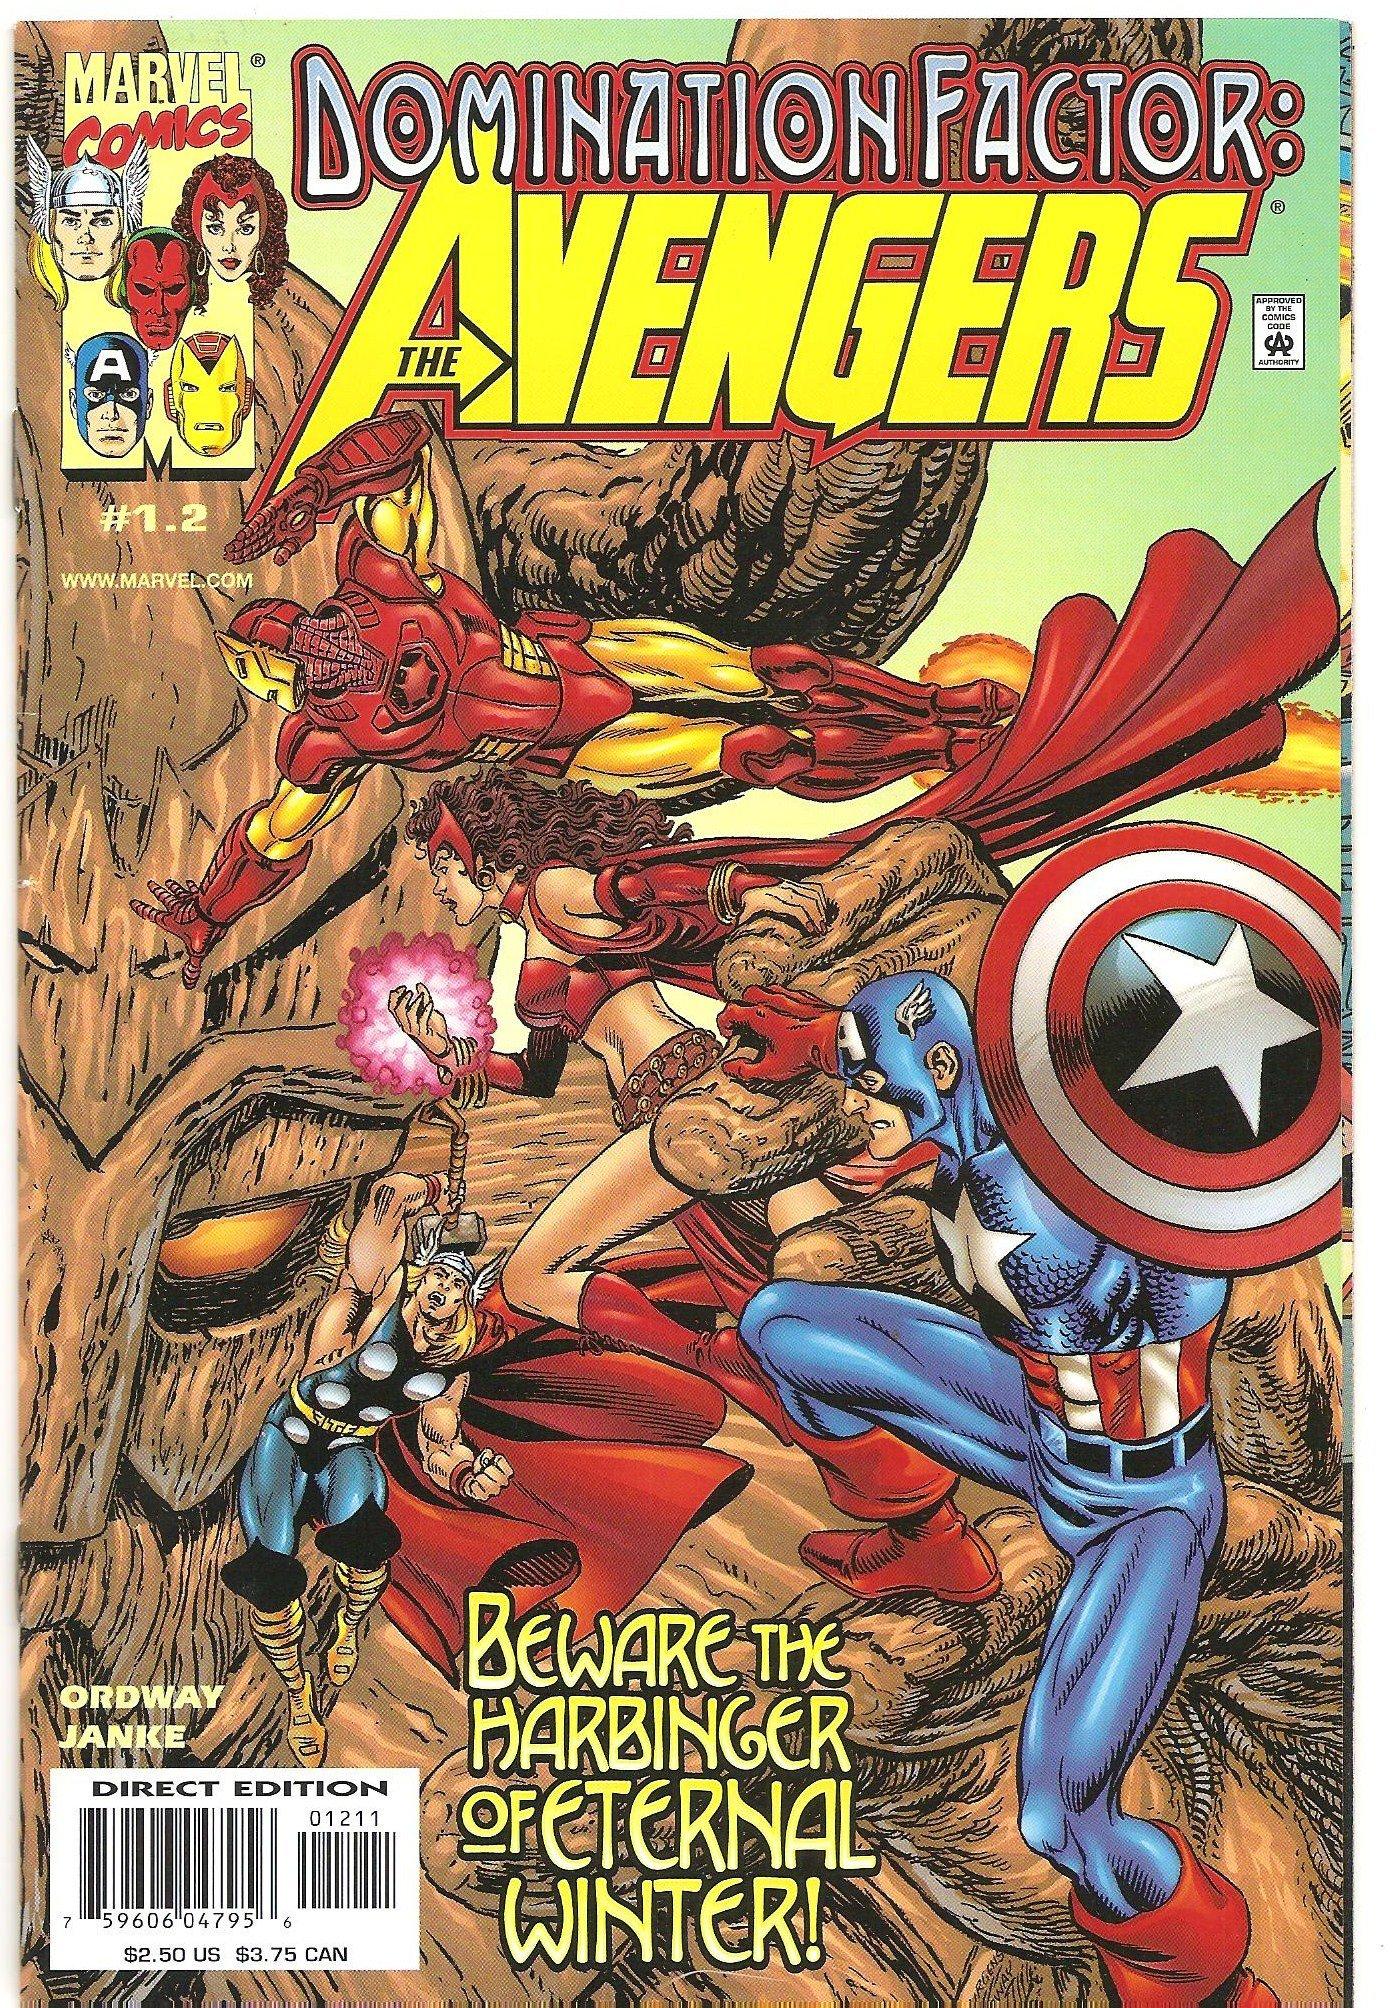 Amazon.com: Domination Factor : Avengers #1.2 (The Praxis ...